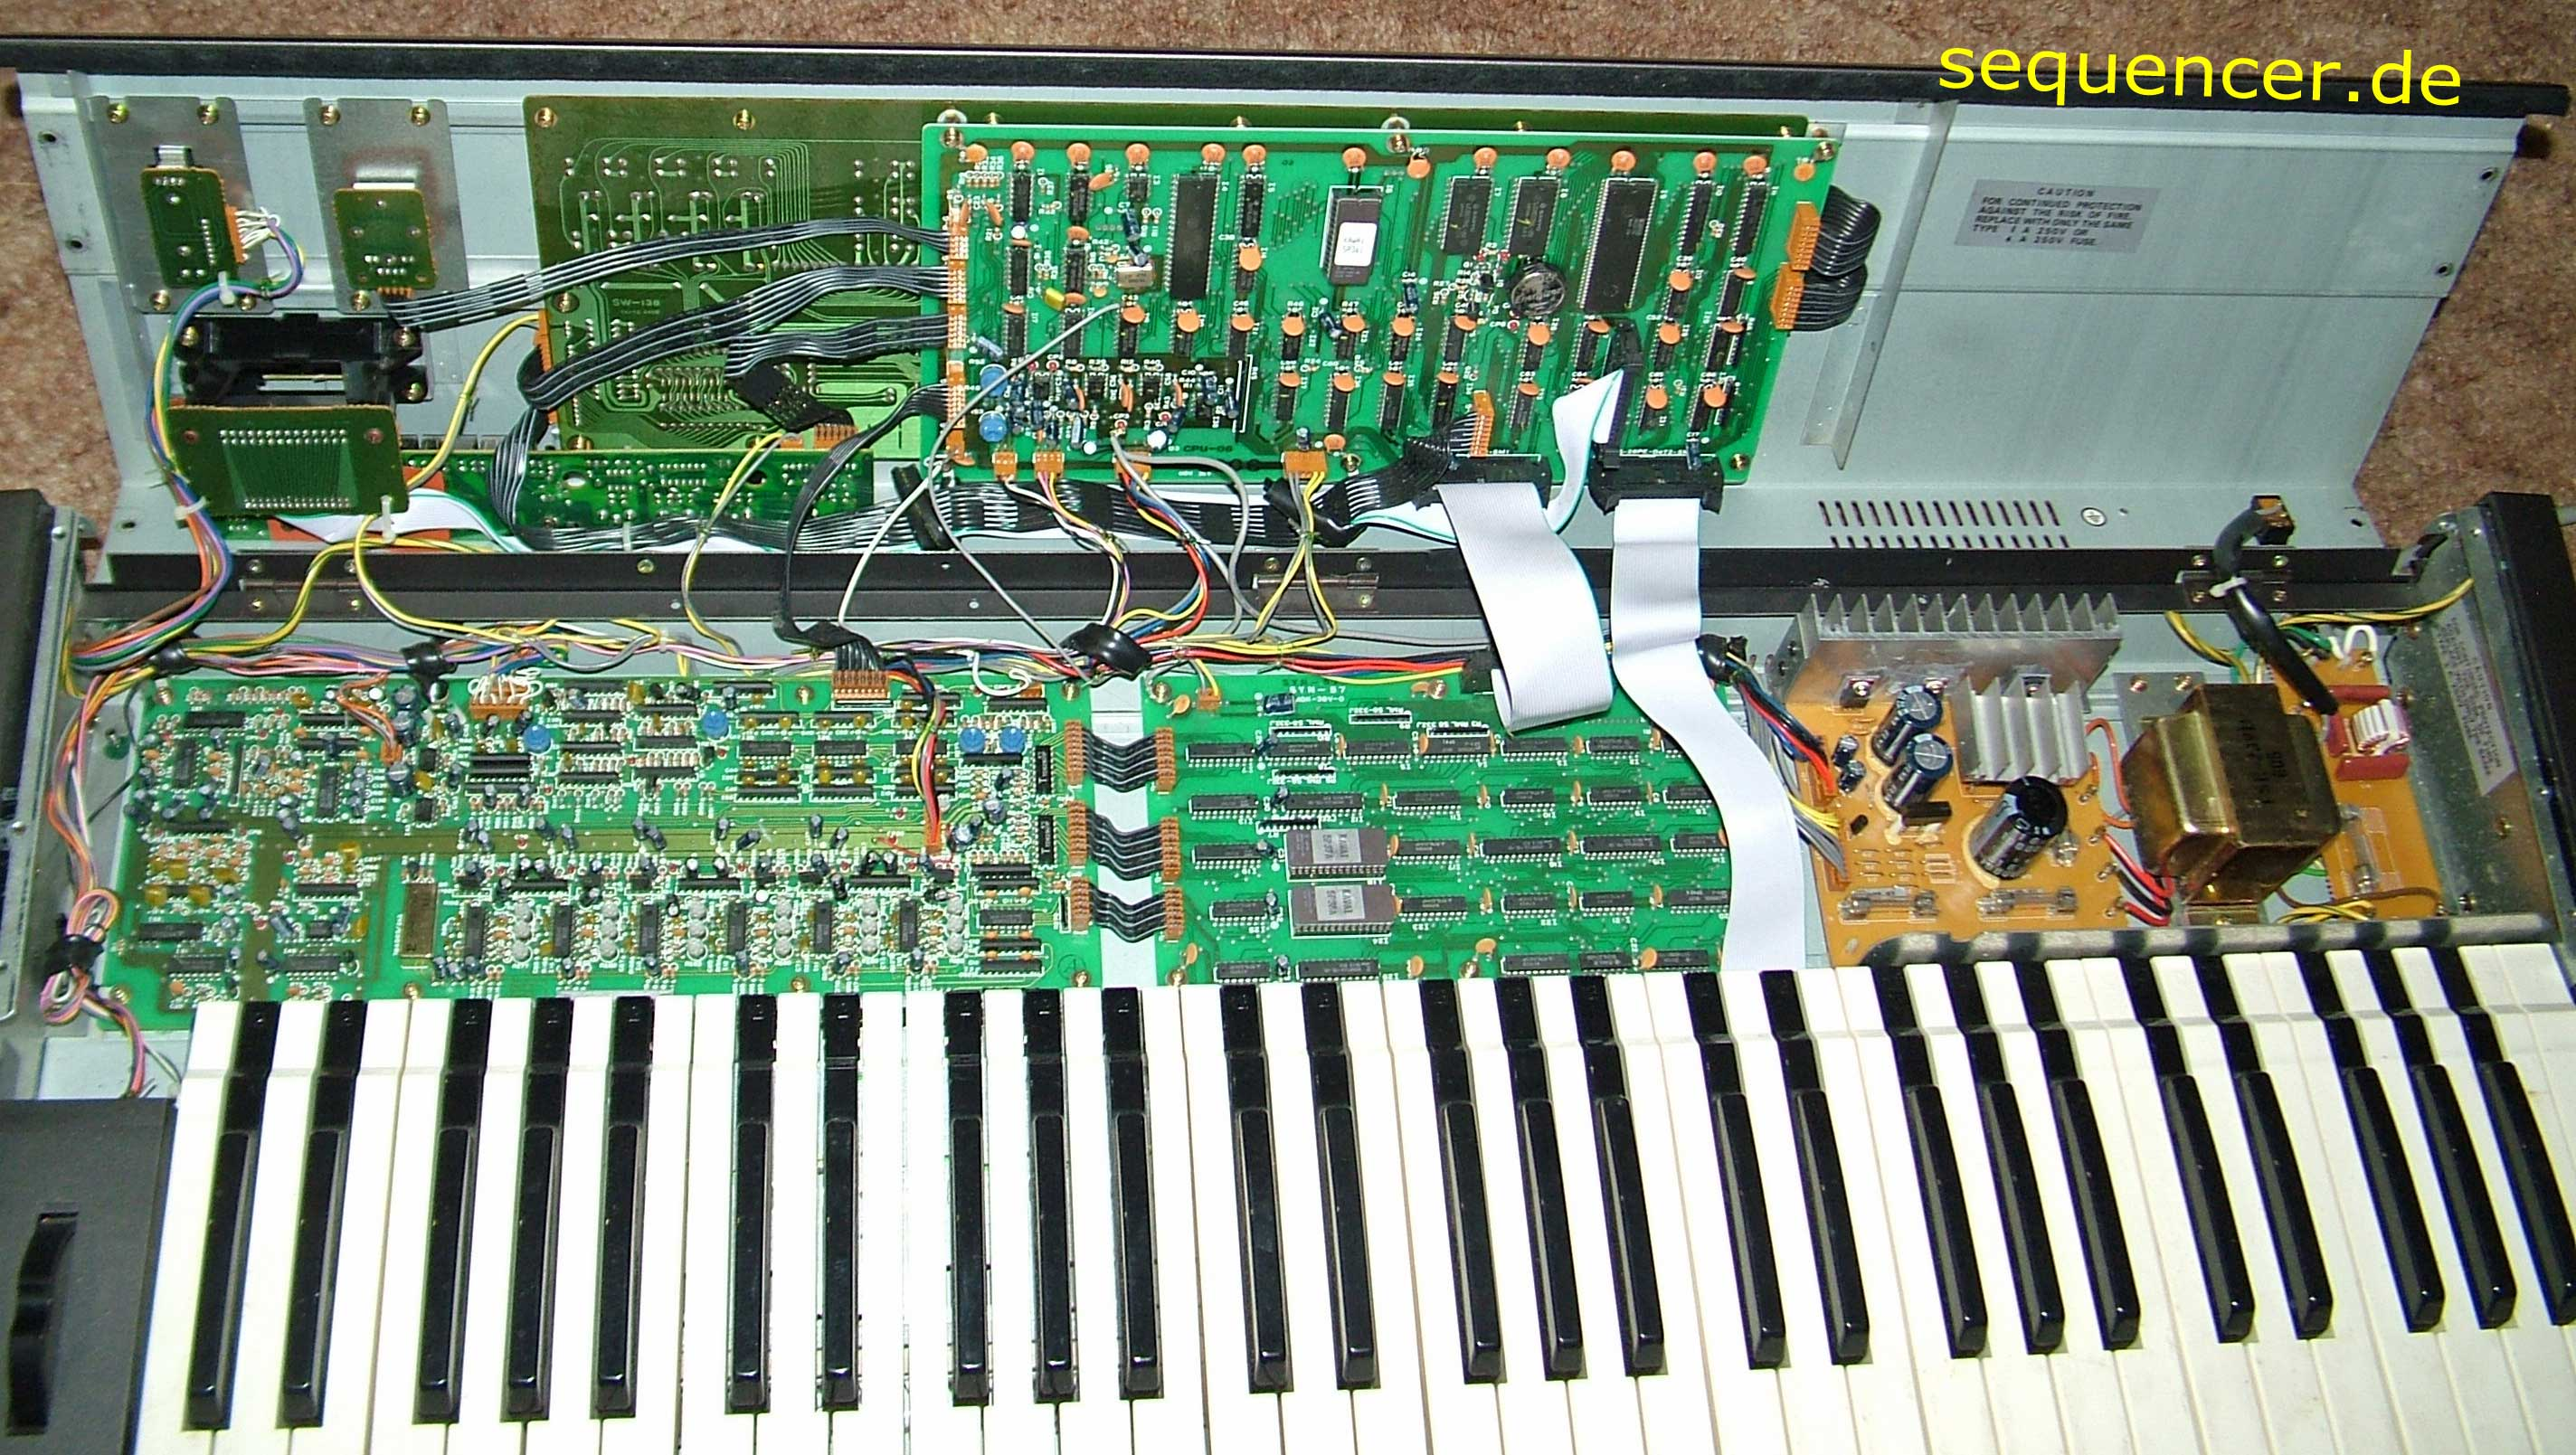 Kawai K-3 offen Kawai K-3 open synthesizer